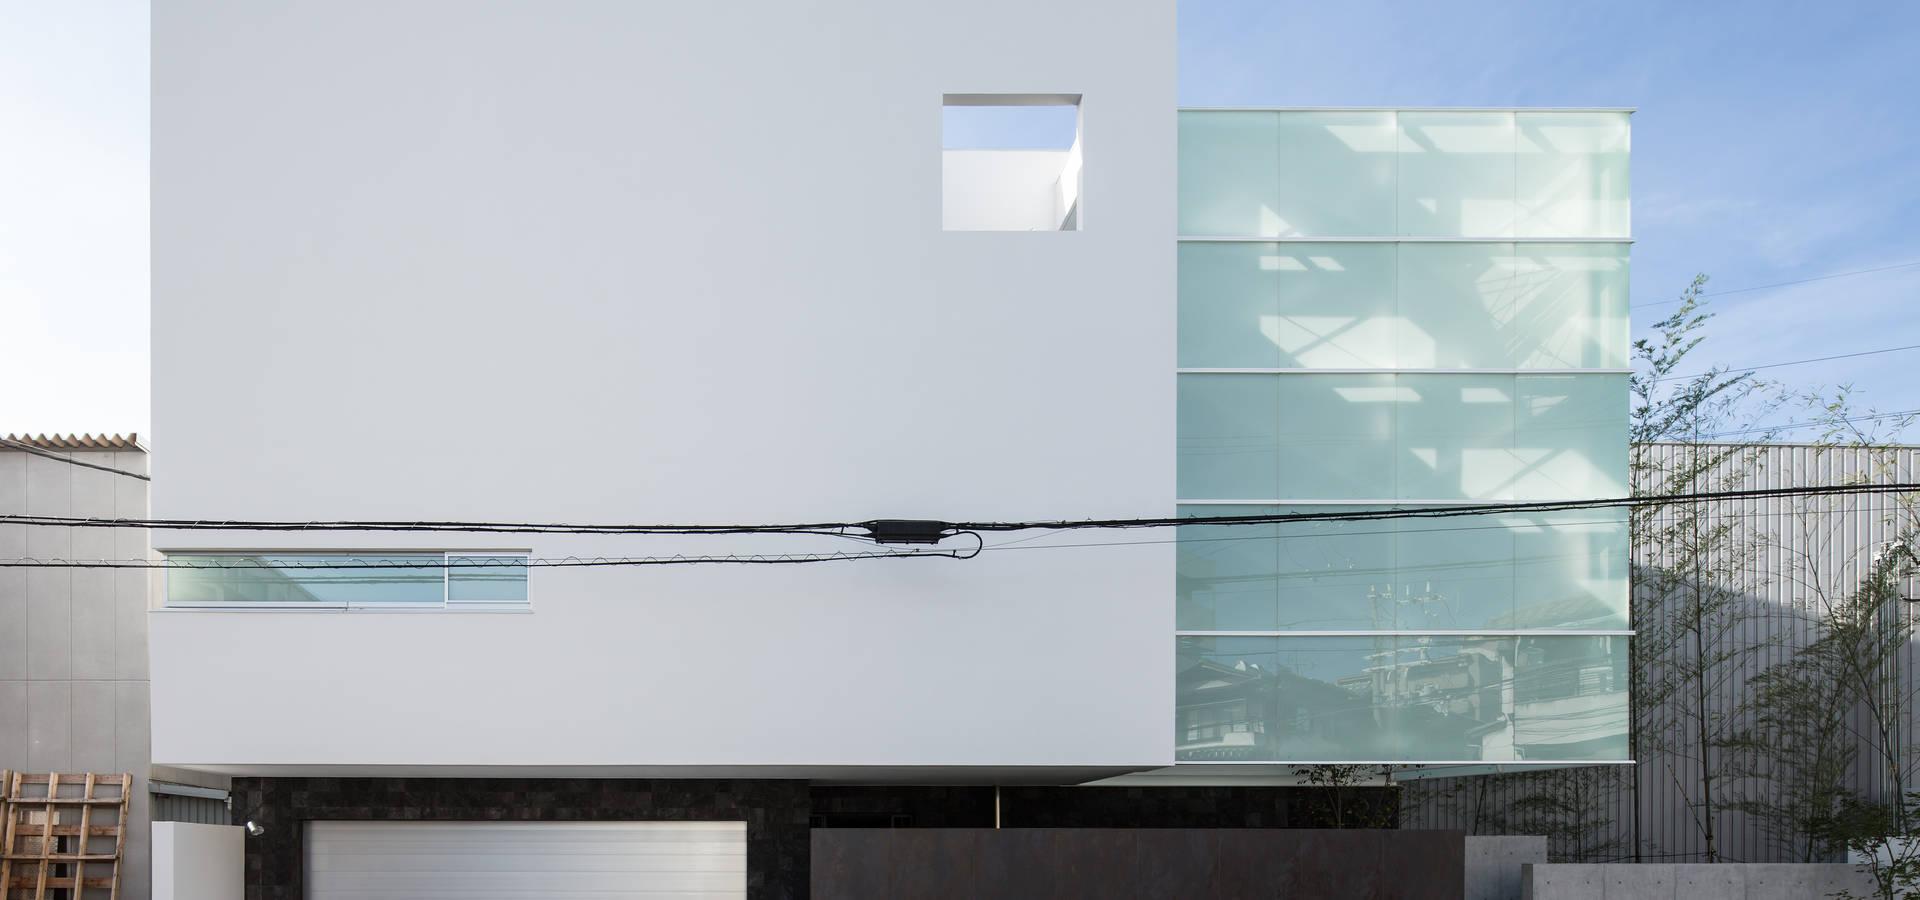 Abax Architects